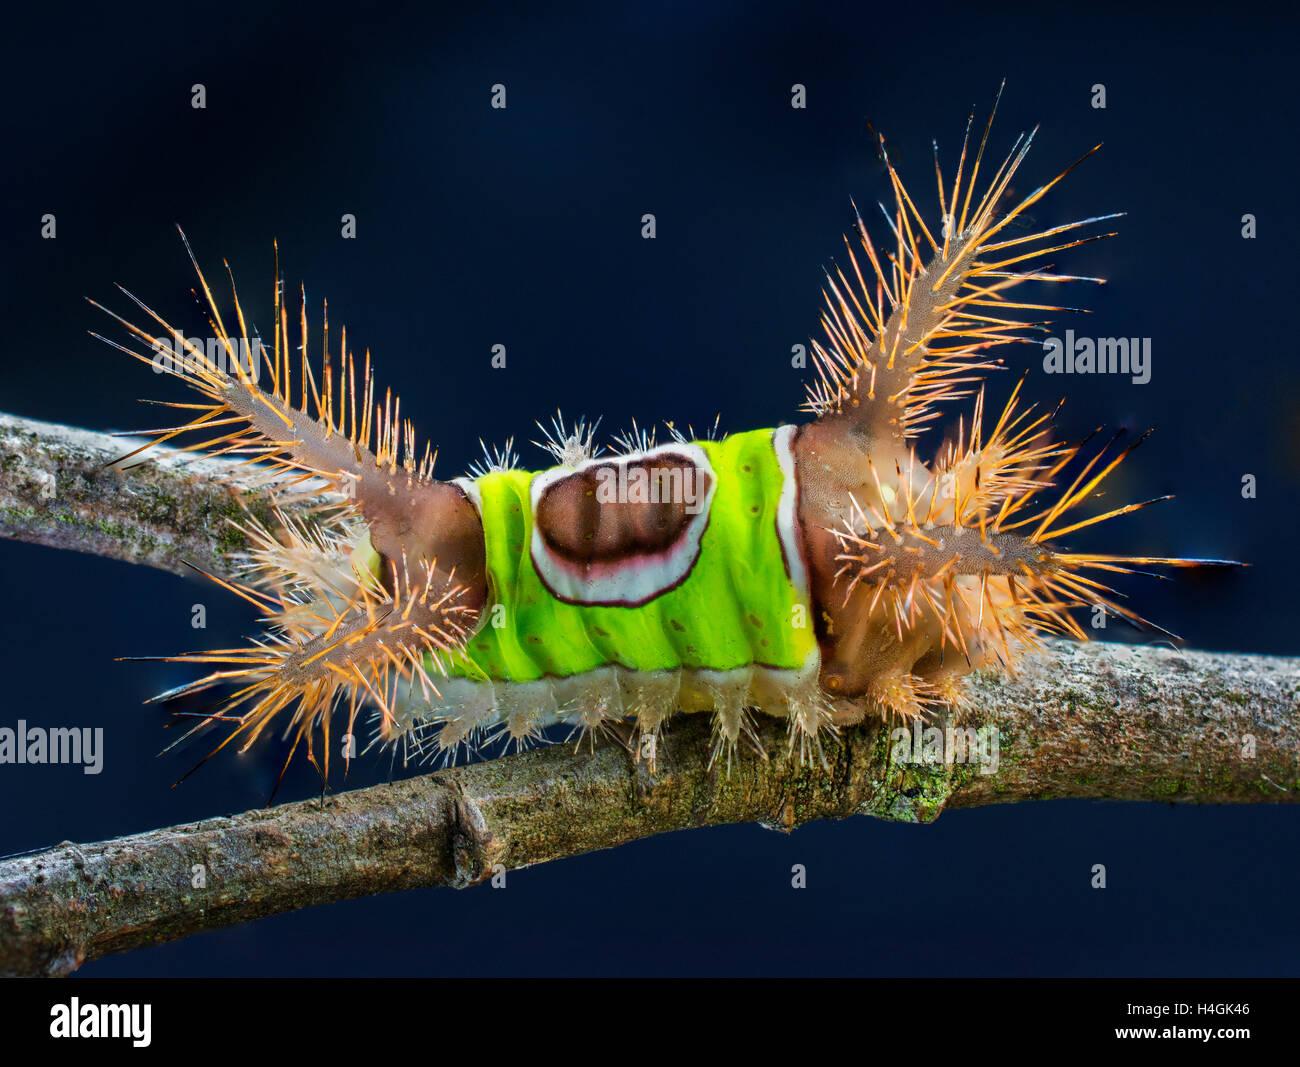 Saddleback Caterpillar - Stock Image